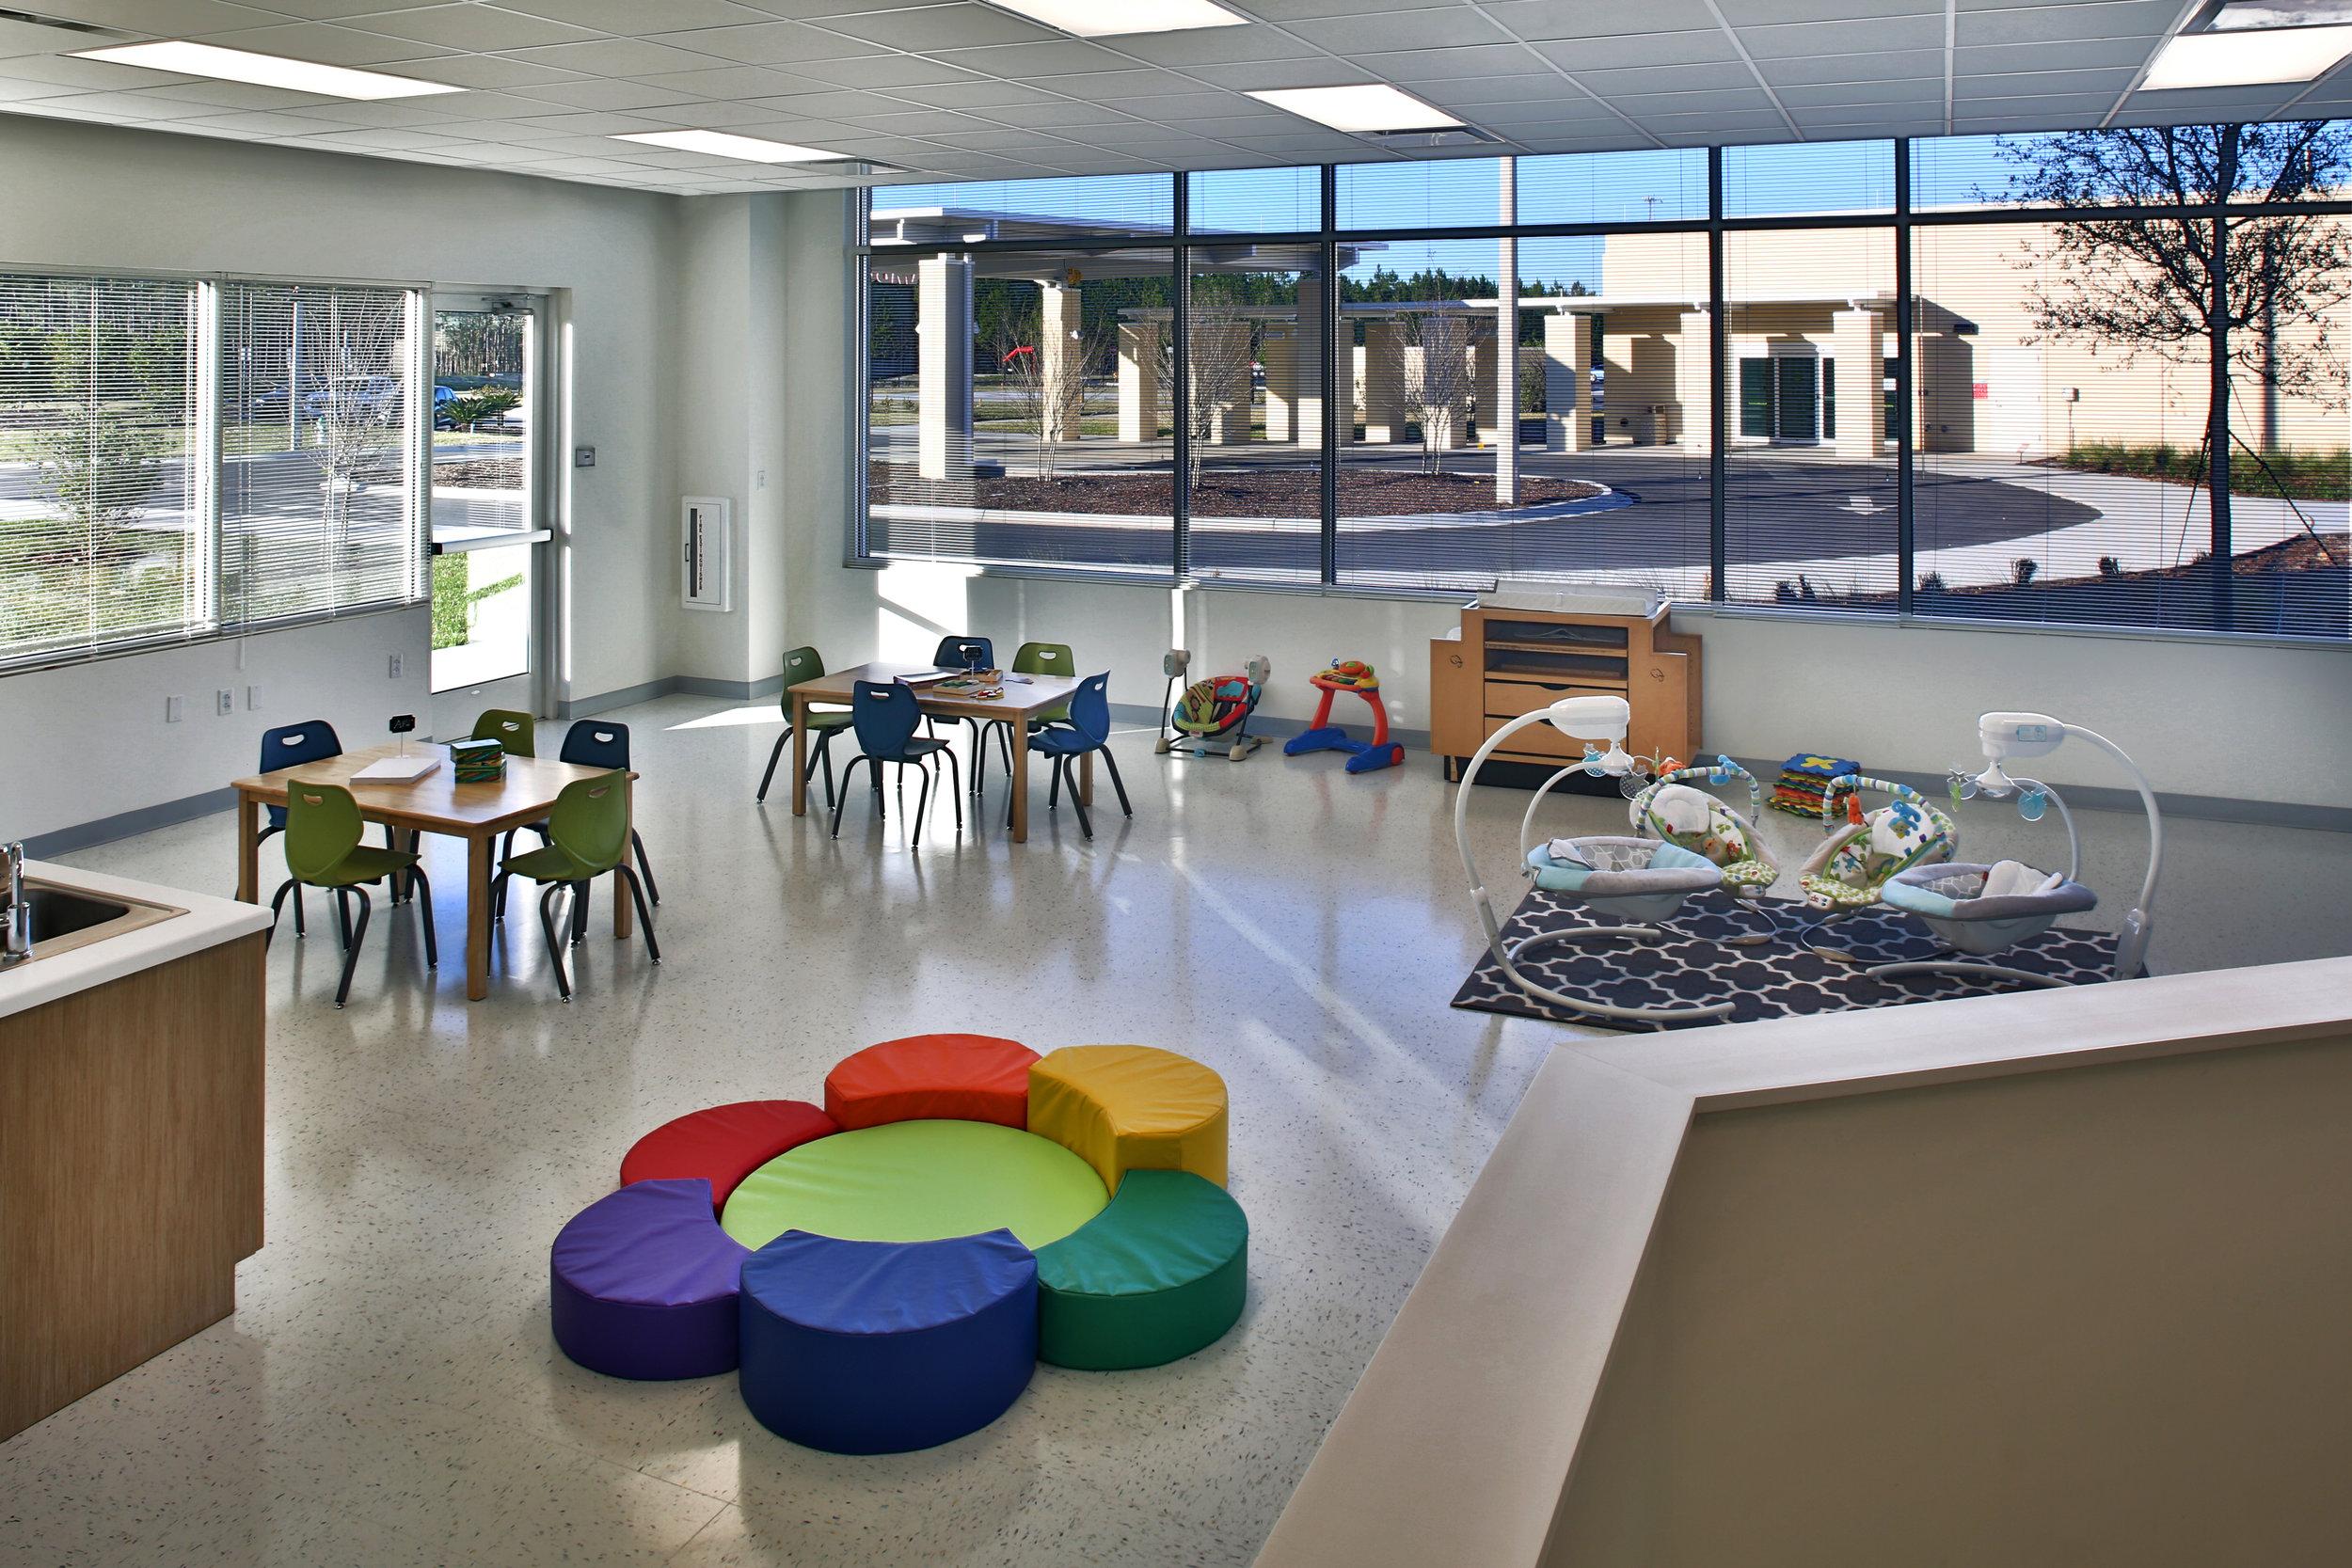 Baptist North YMCA Childcare Area.jpg